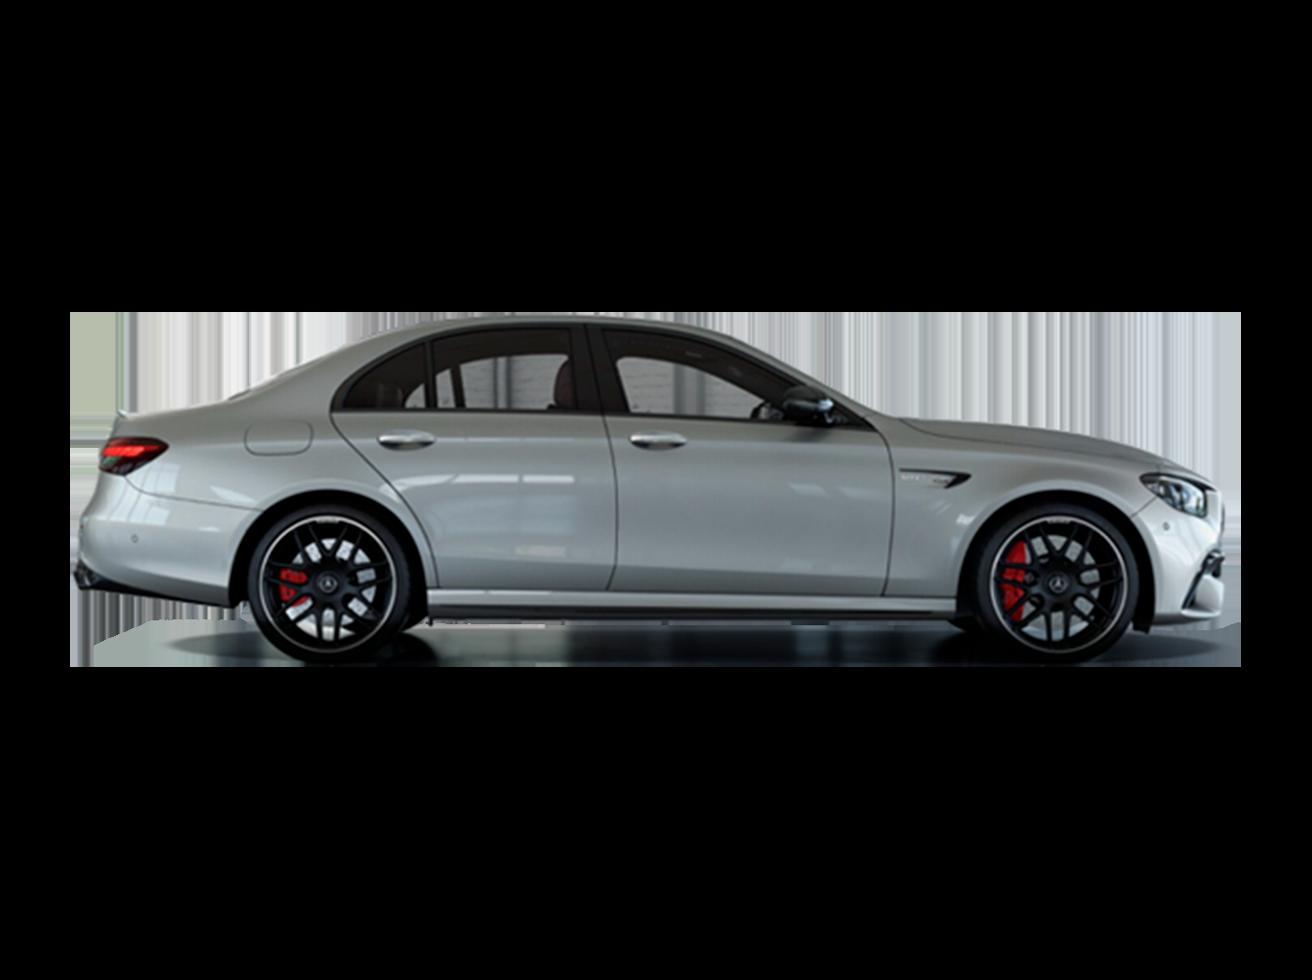 4.0 V8 TURBO GASOLINA S 4MATIC+ 9G-TRONIC